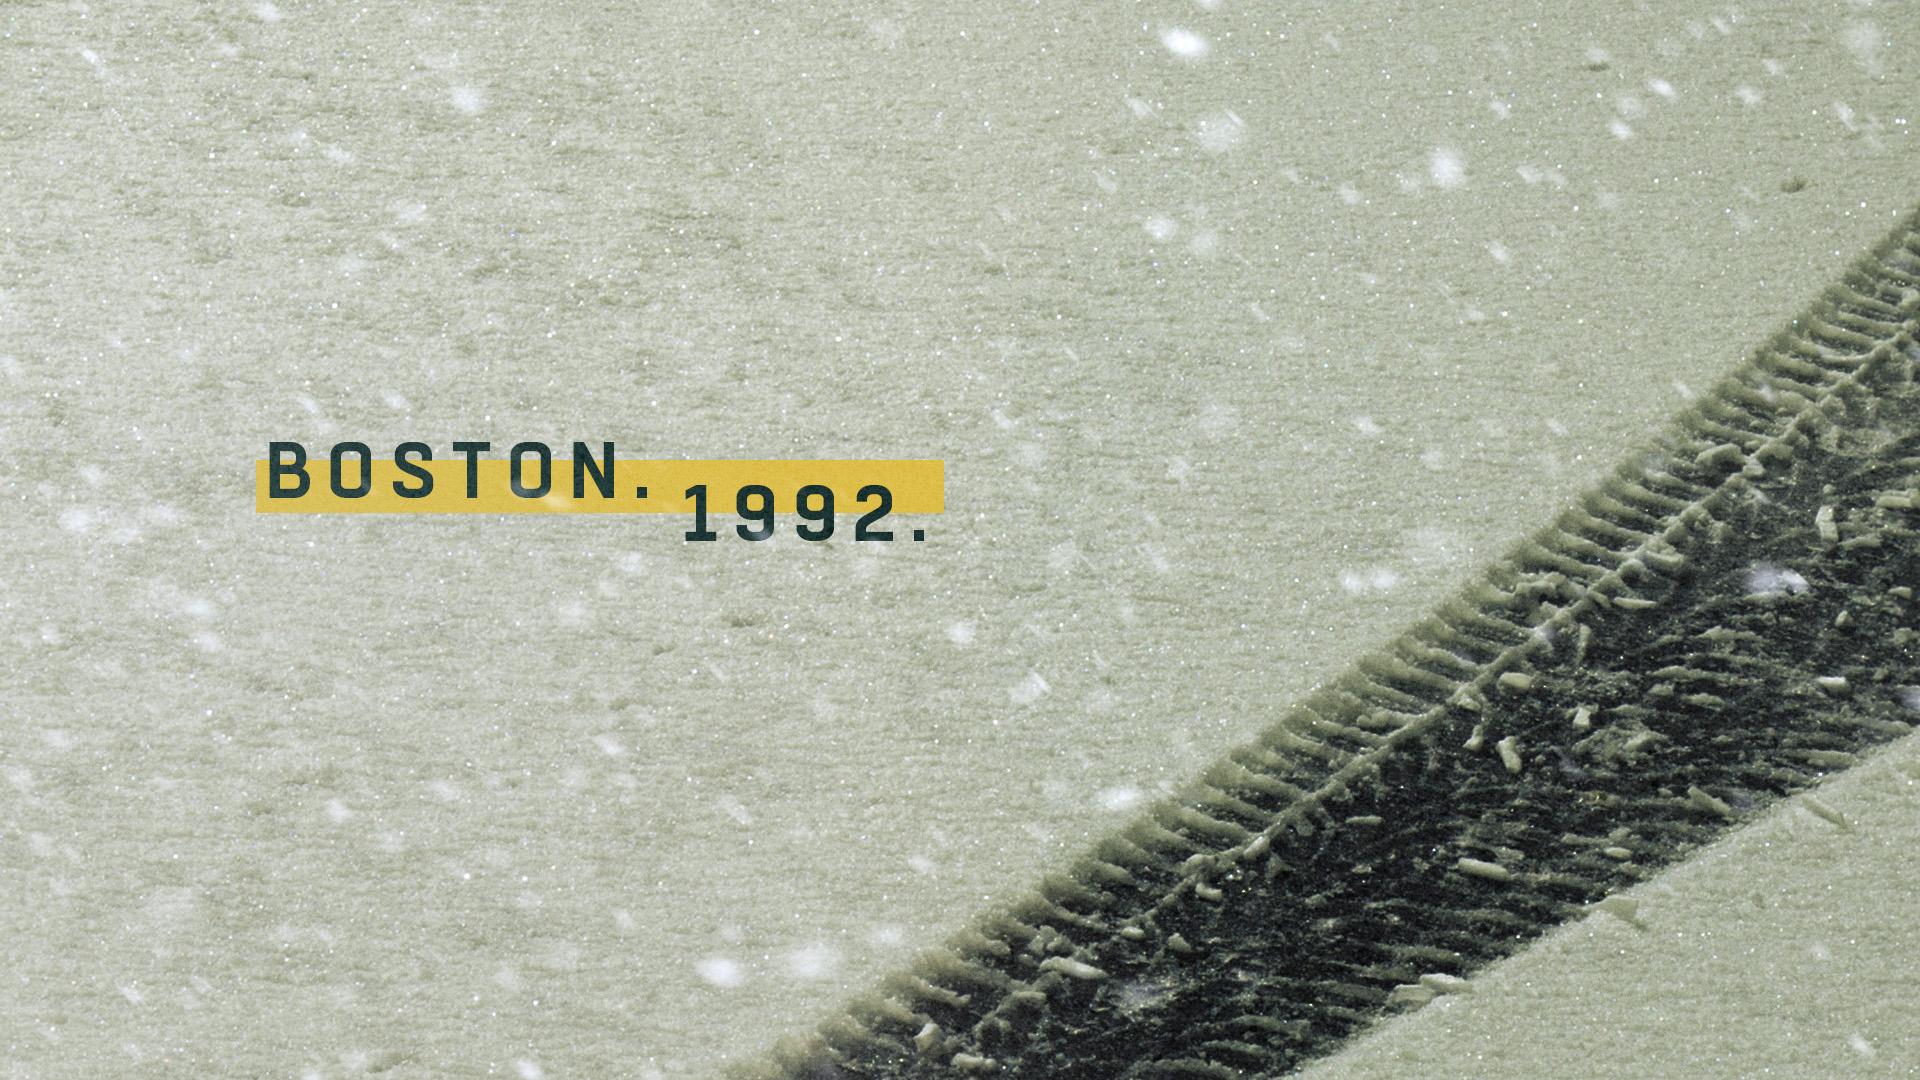 190207_CityOnAHill_Packaging_Snow_Internal_02.jpg